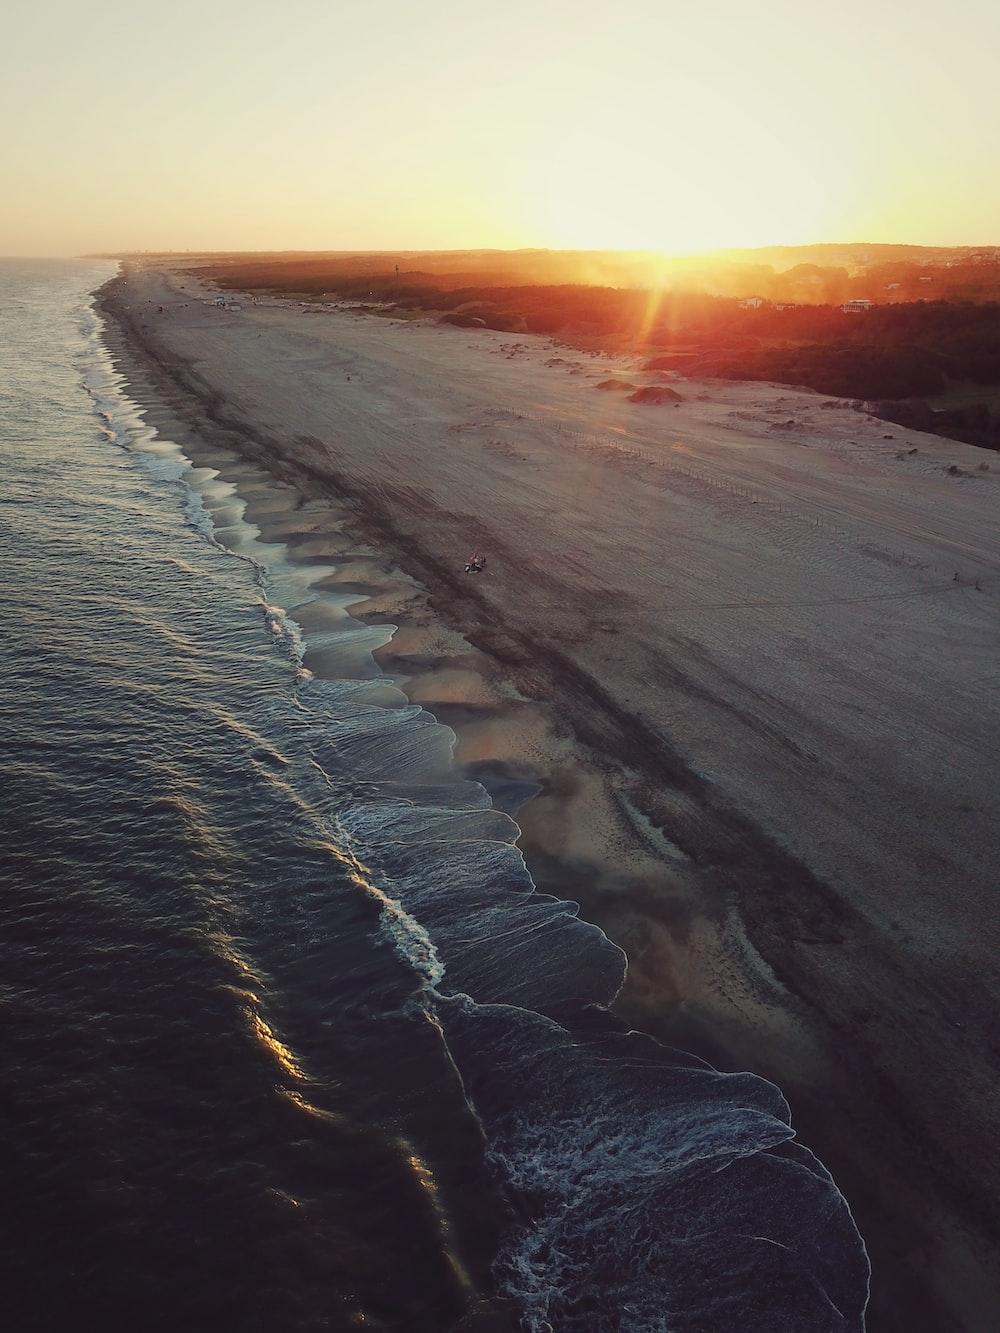 gray beach sand during golden hour